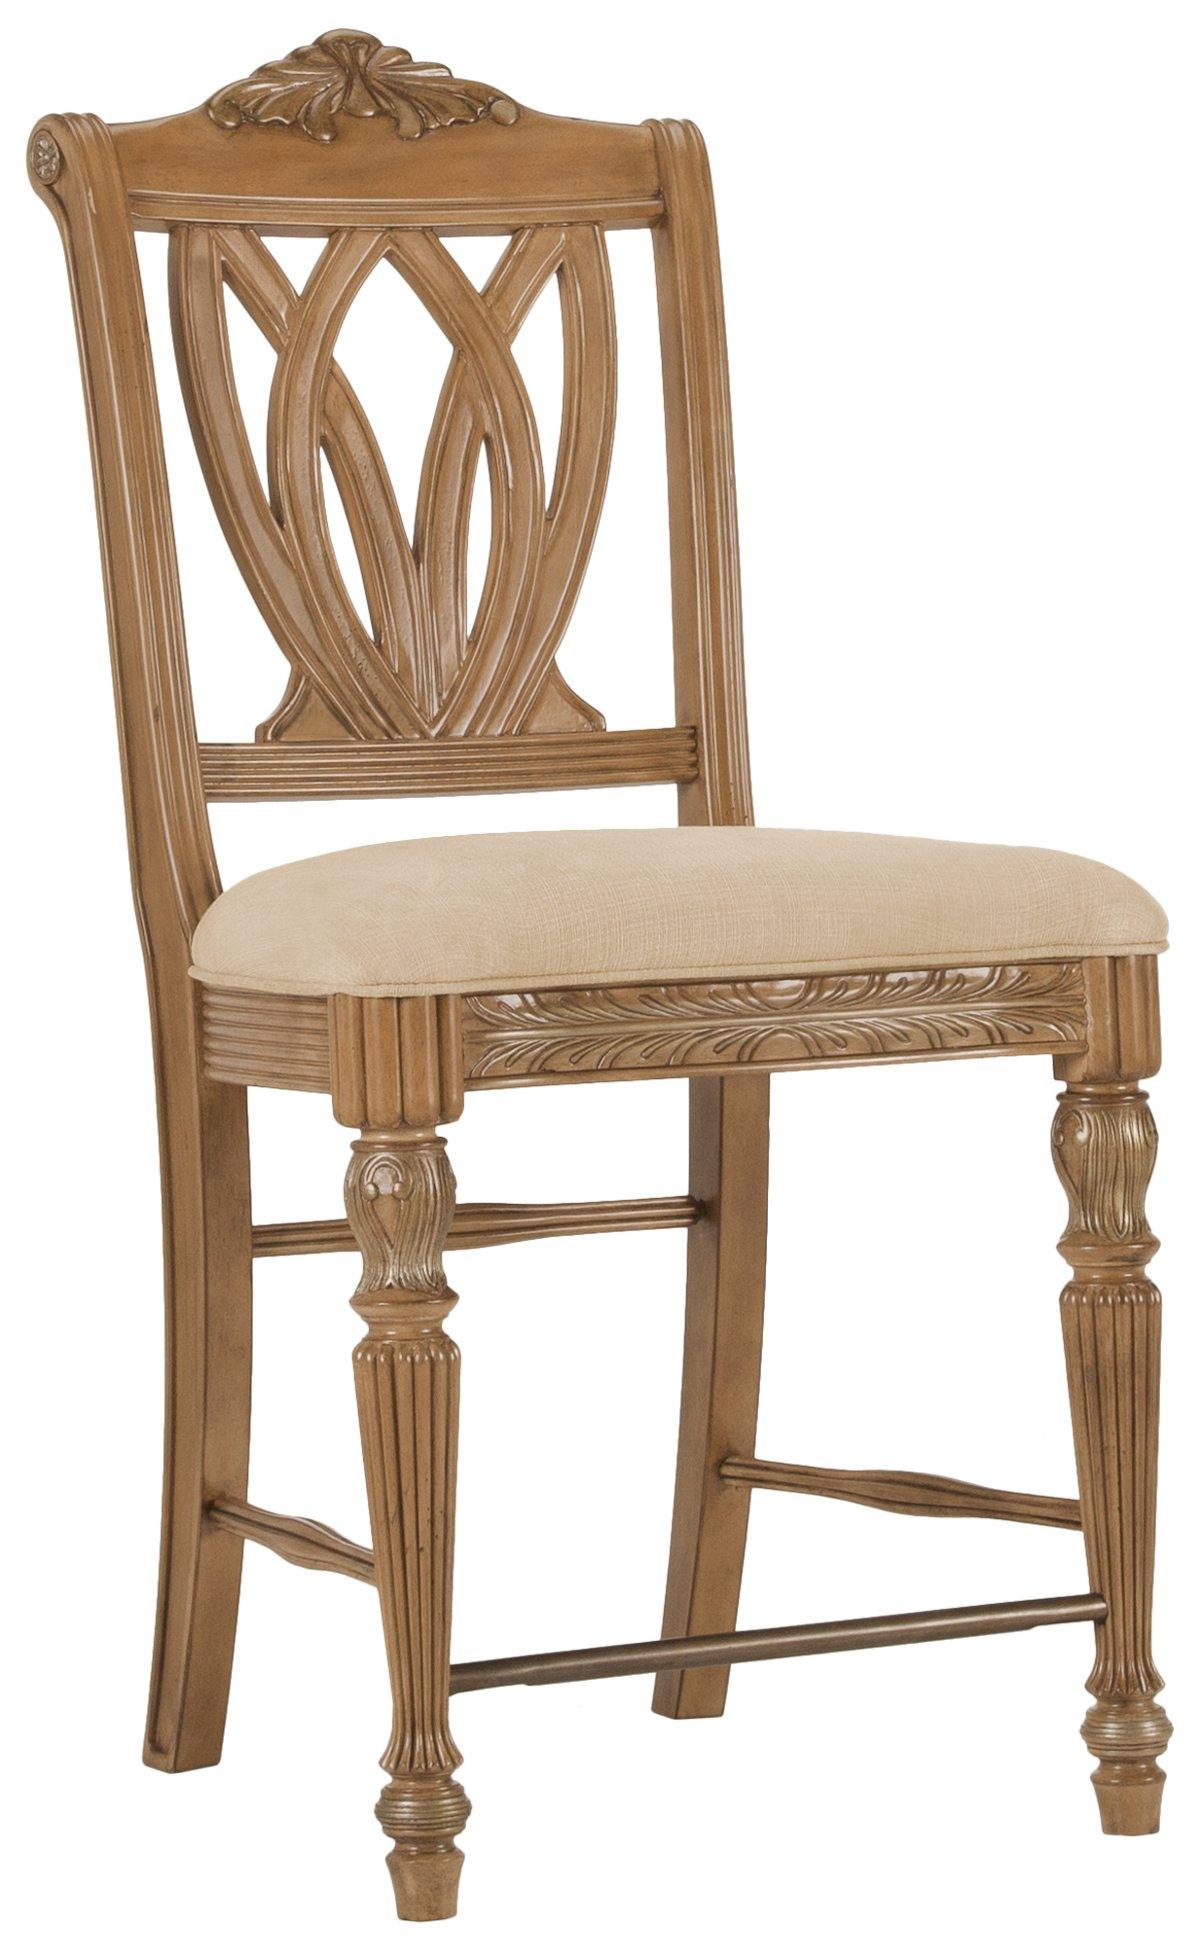 "City Furniture Tradewinds2 Light Tone 24"" Wood Barstool"